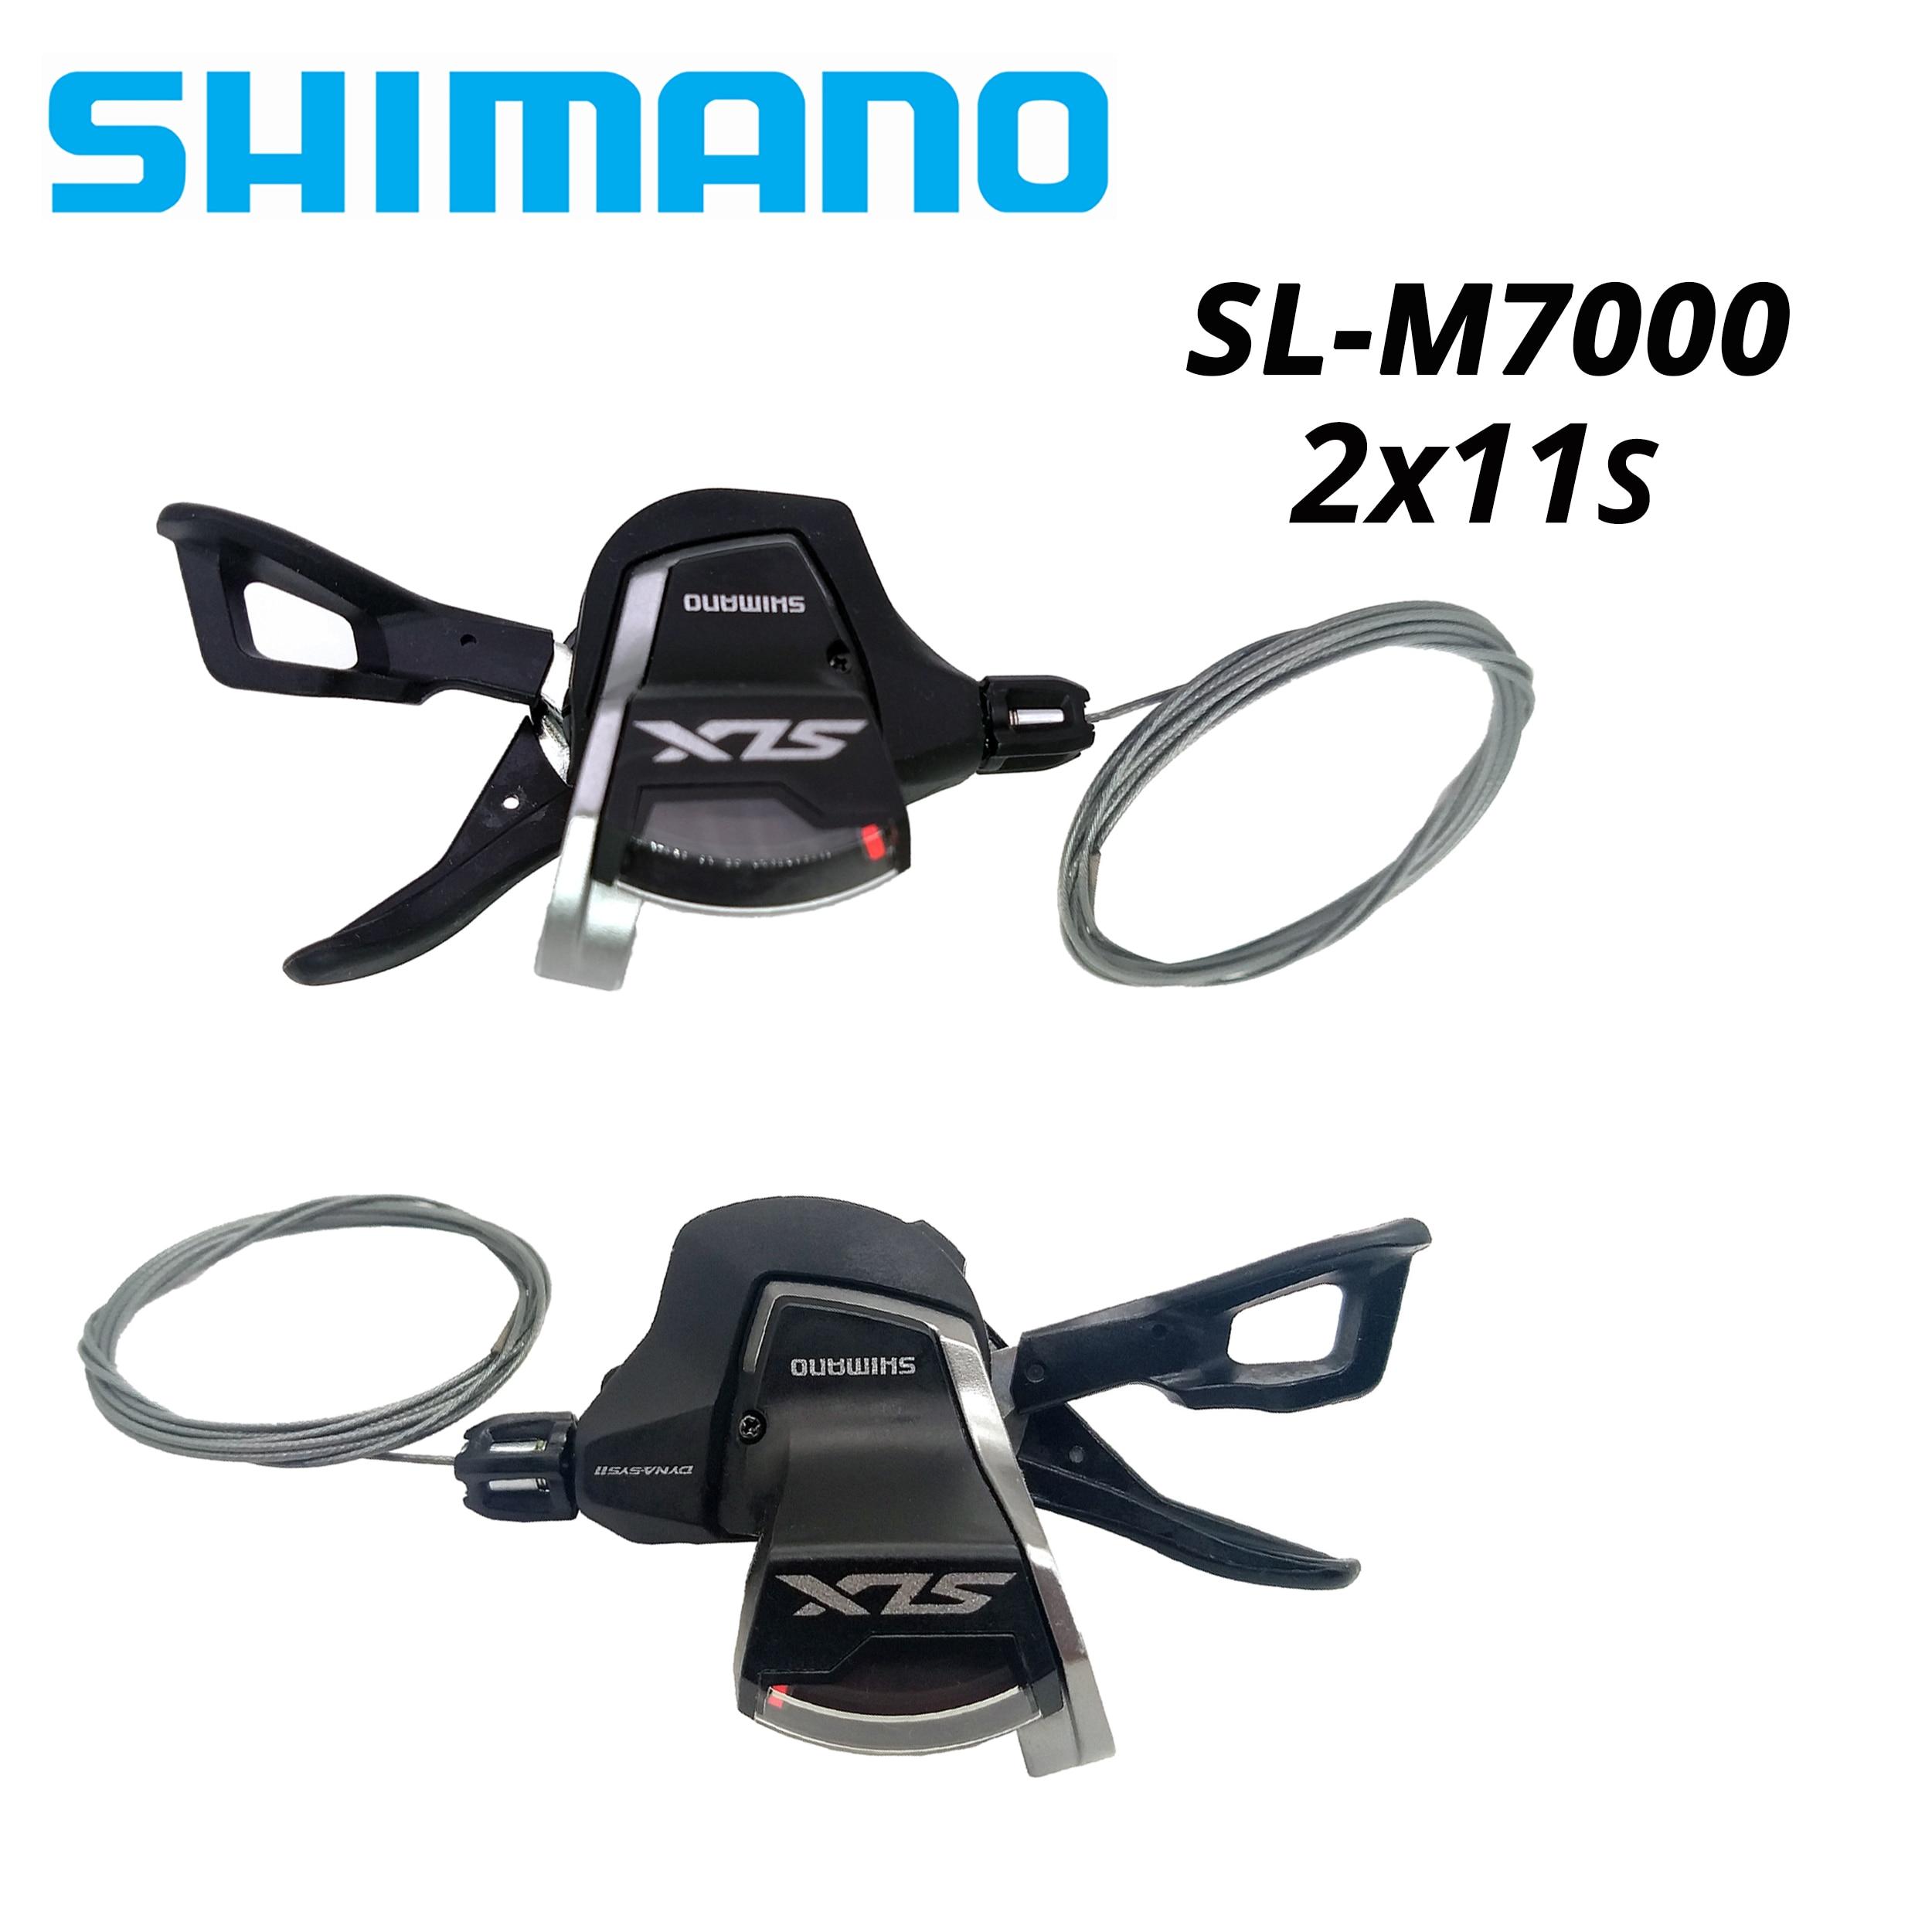 Shimano-palanca de cambios para bicicleta Deore seis SL M7000... SL-M7000 2x11 palanca...